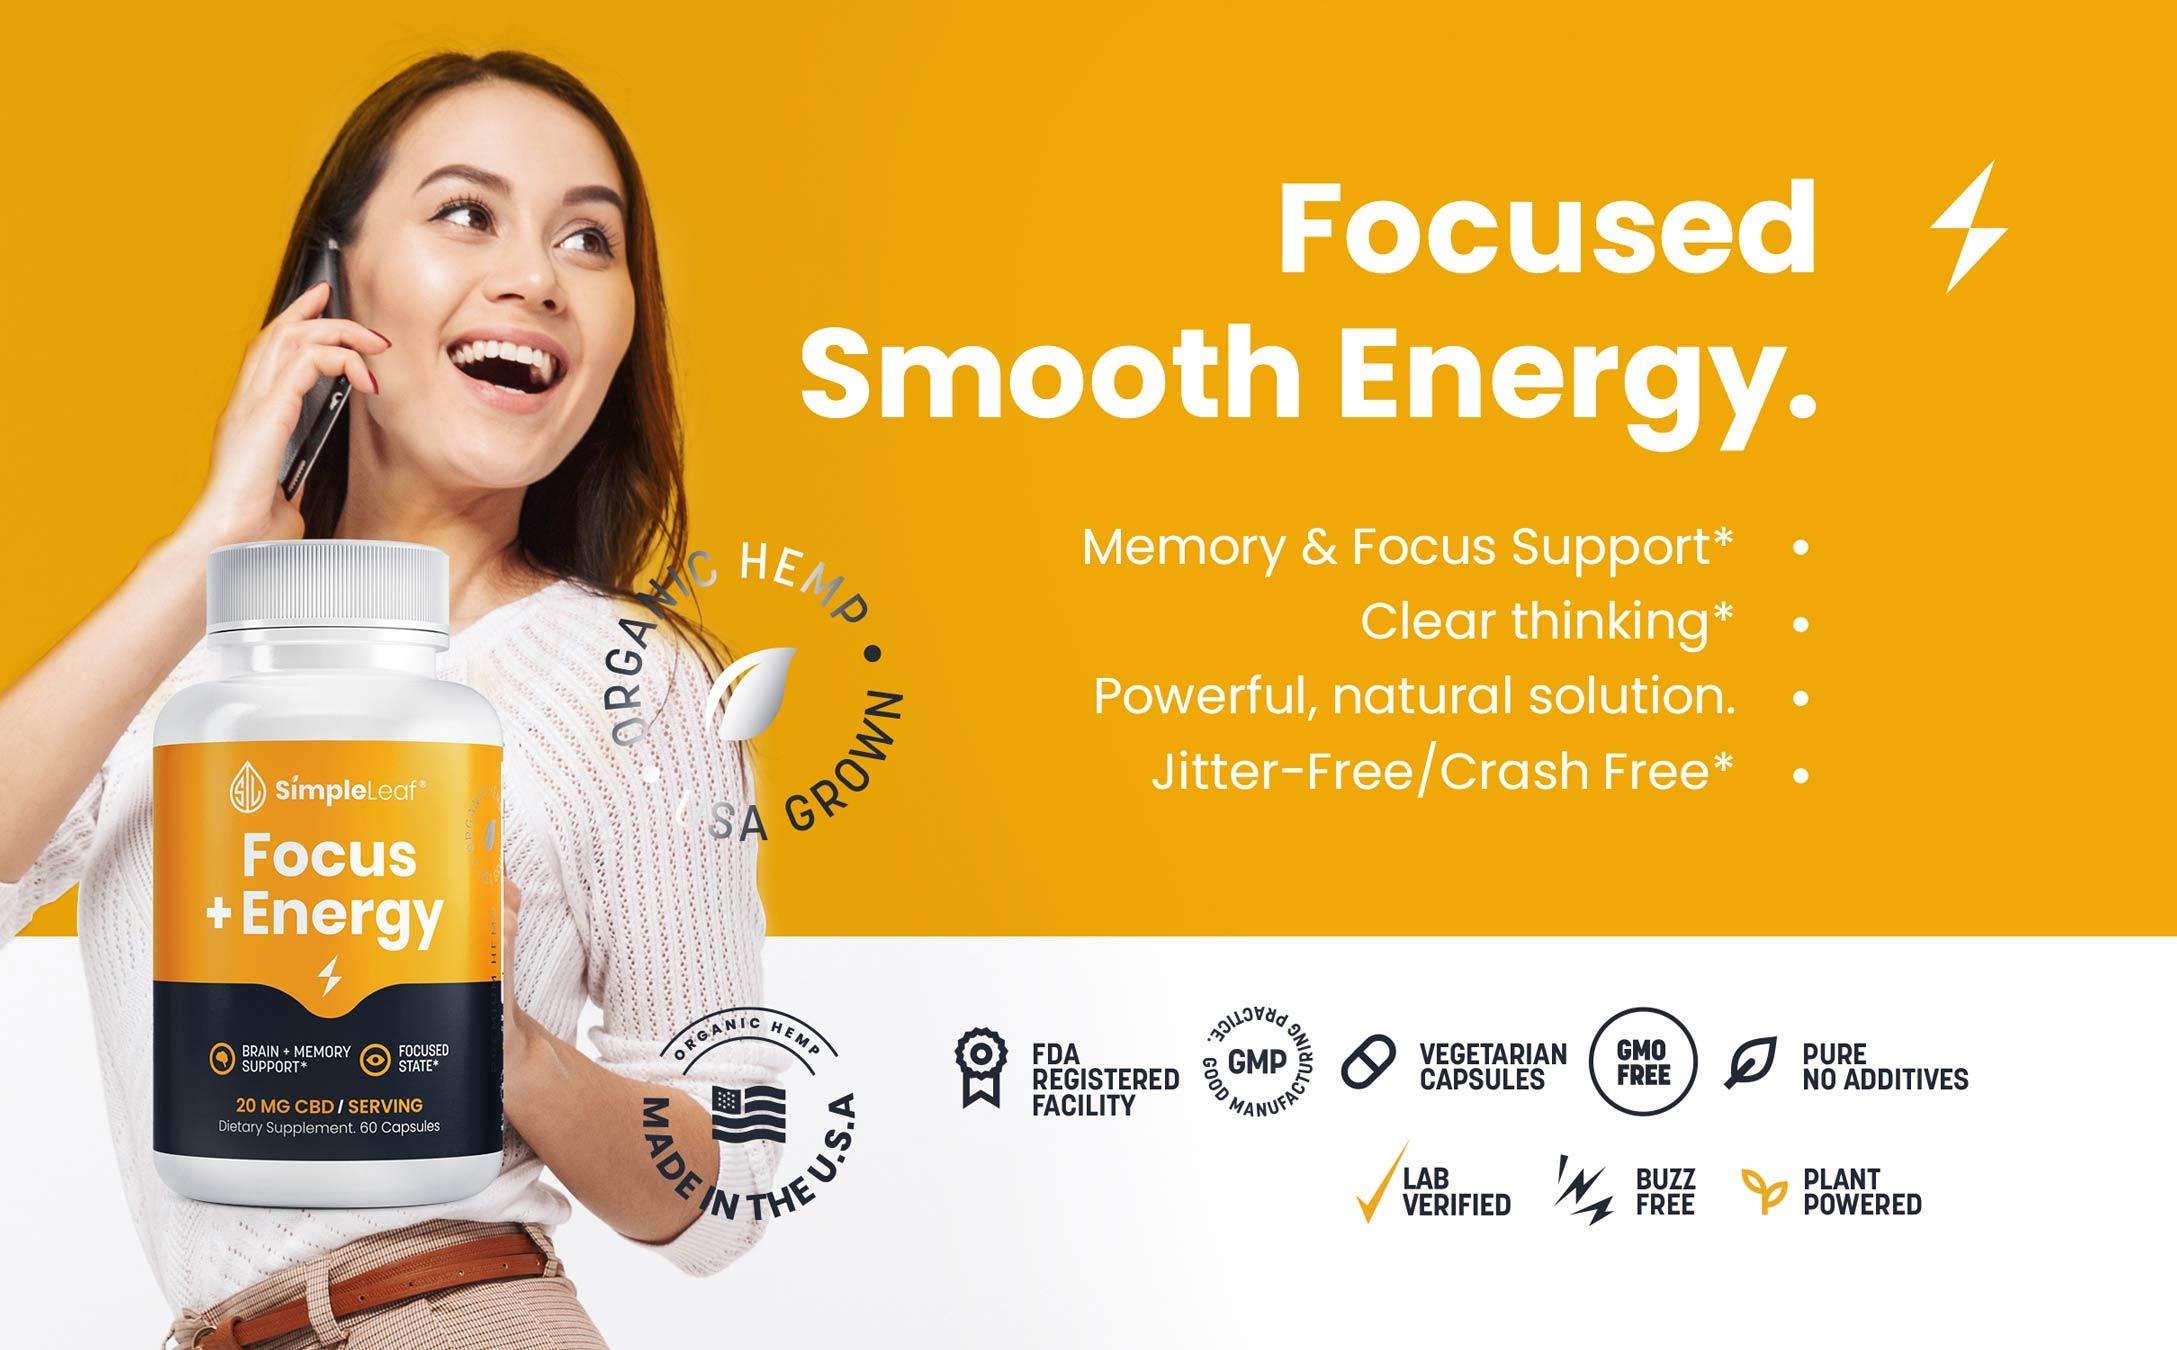 cbd focus energy pills, focus and energy capsules, focus and energy supplements, natural focus pill